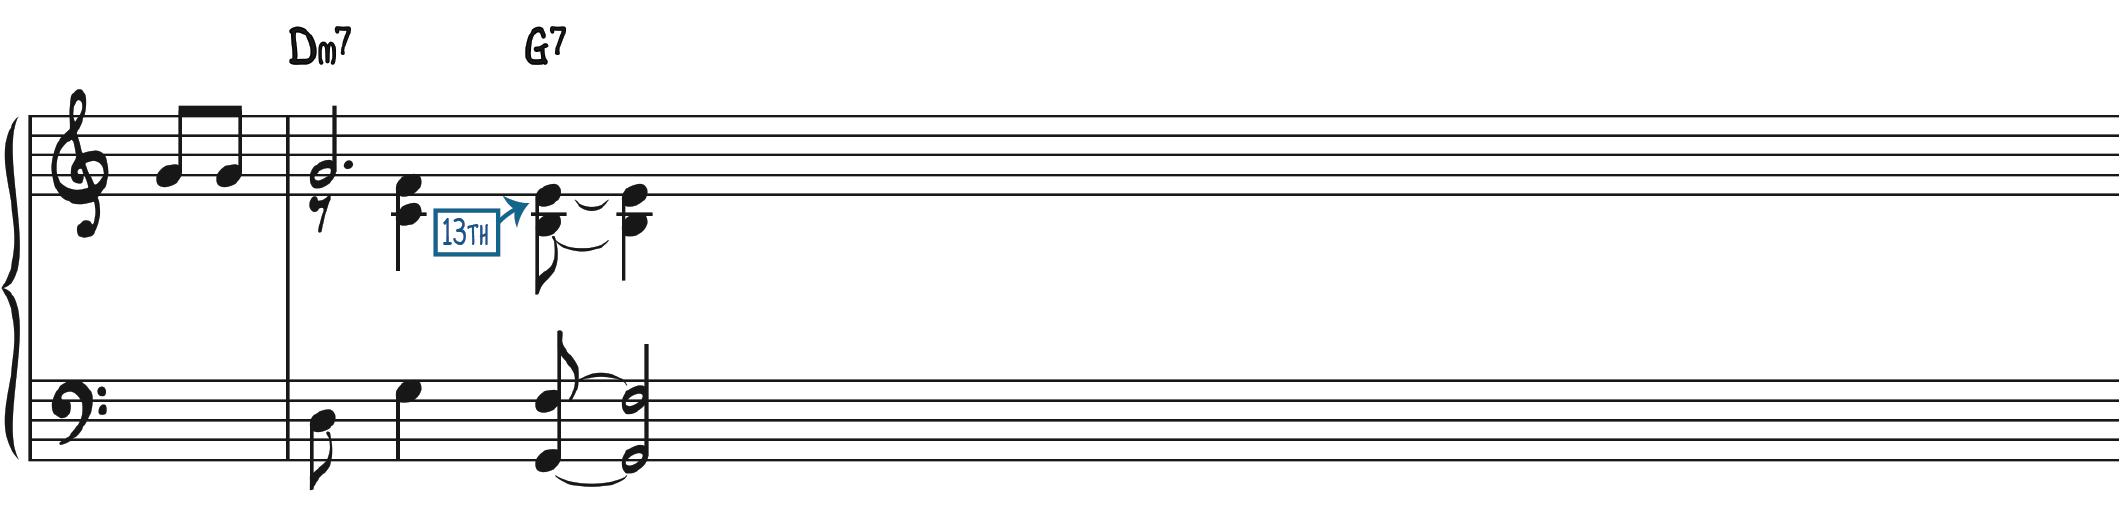 Dominant 13th Jazz Piano Chord